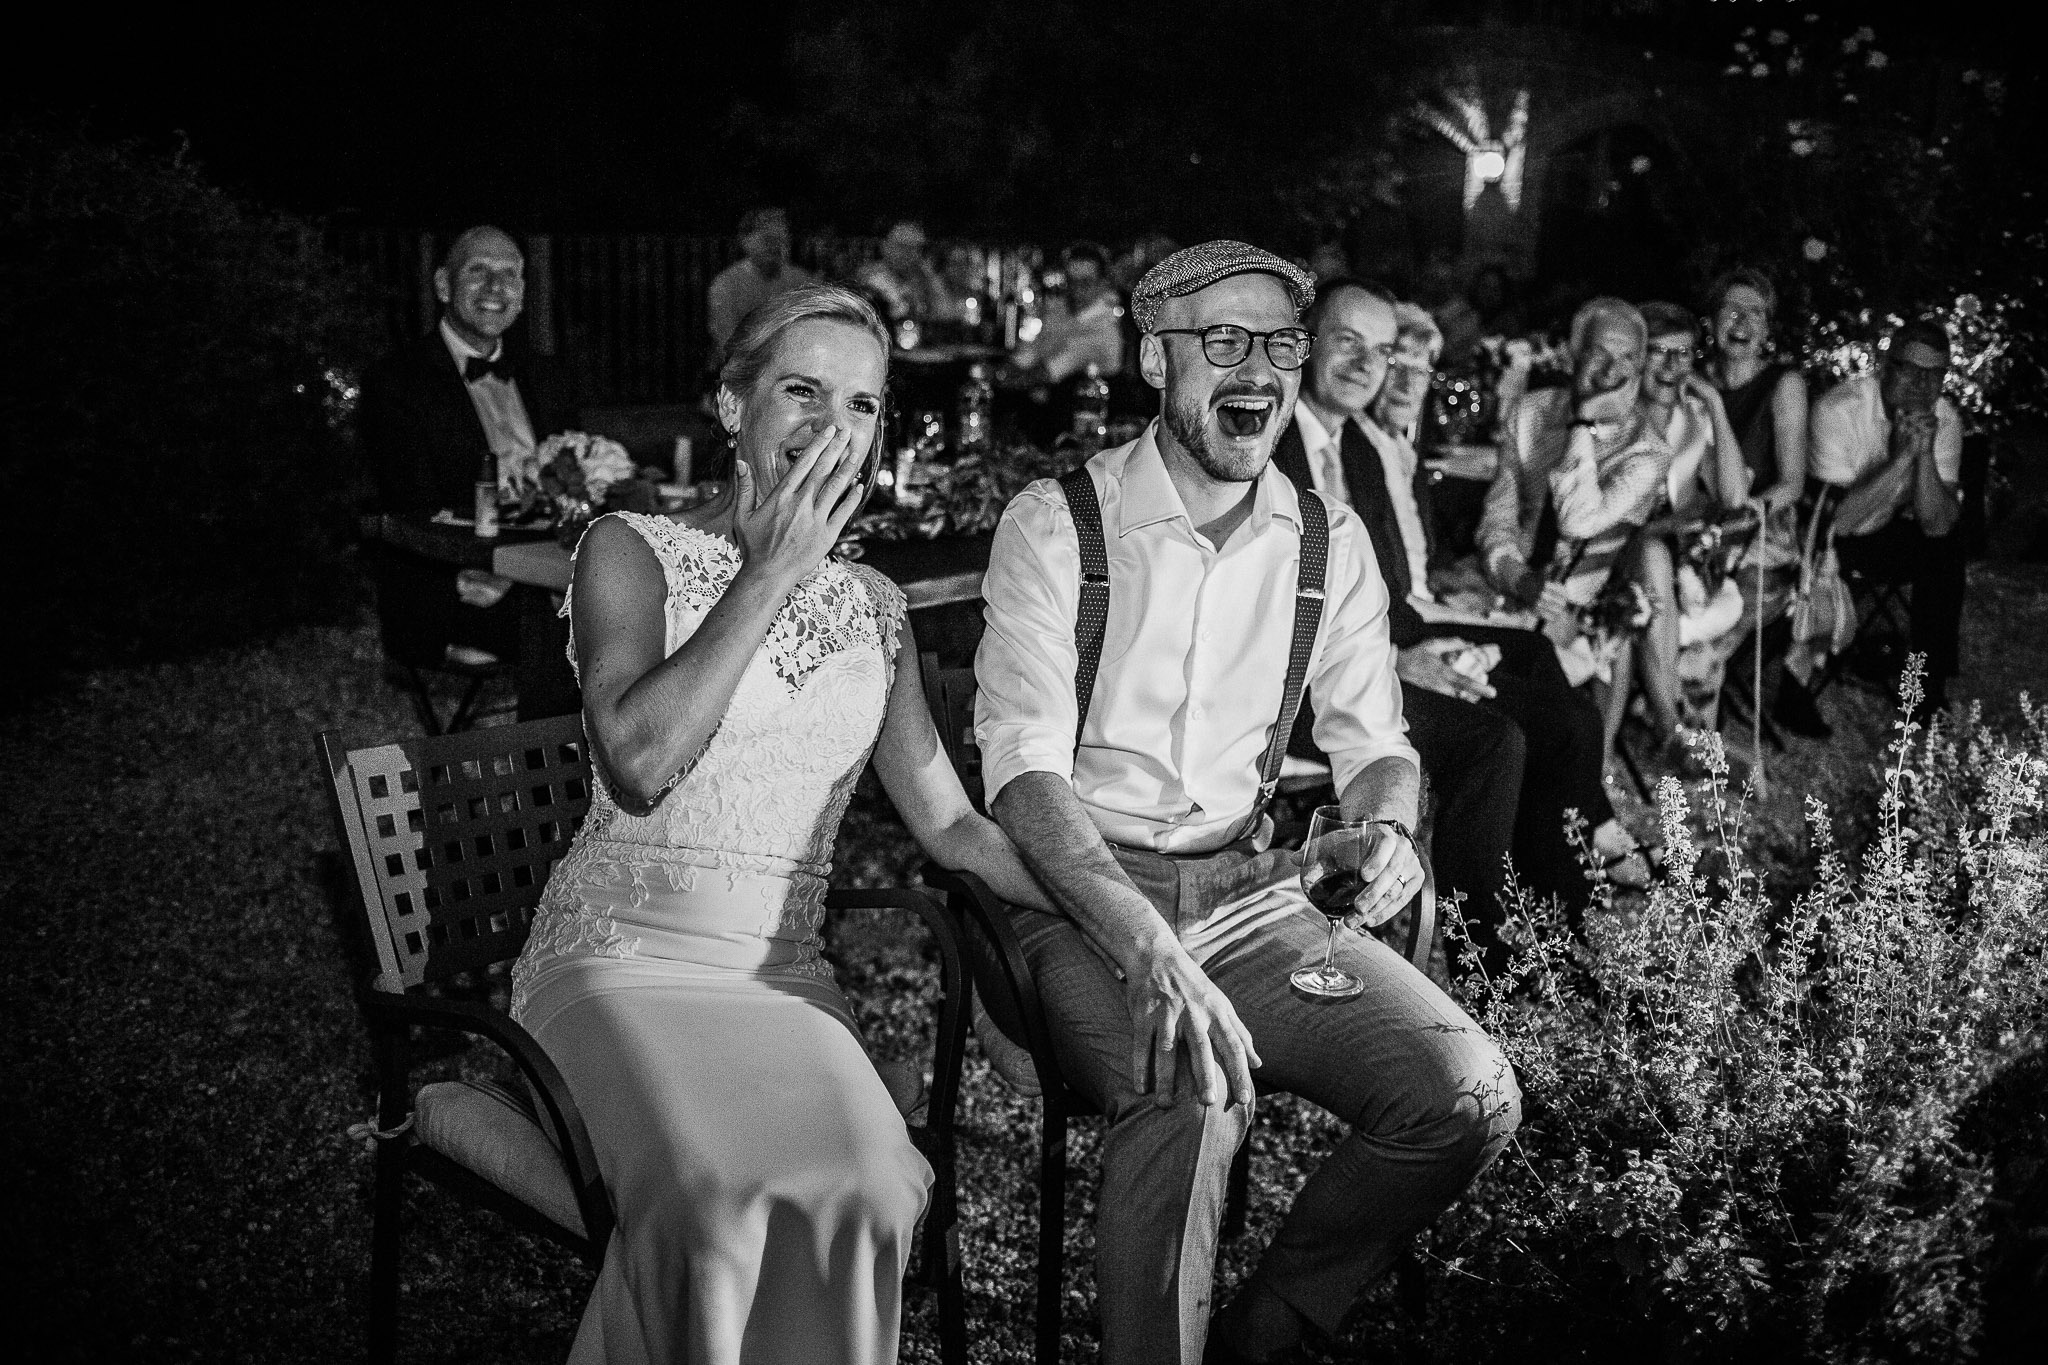 Bride and groom at their wedding party reception in Italy at La Villa Hotel, Mombaruzzo